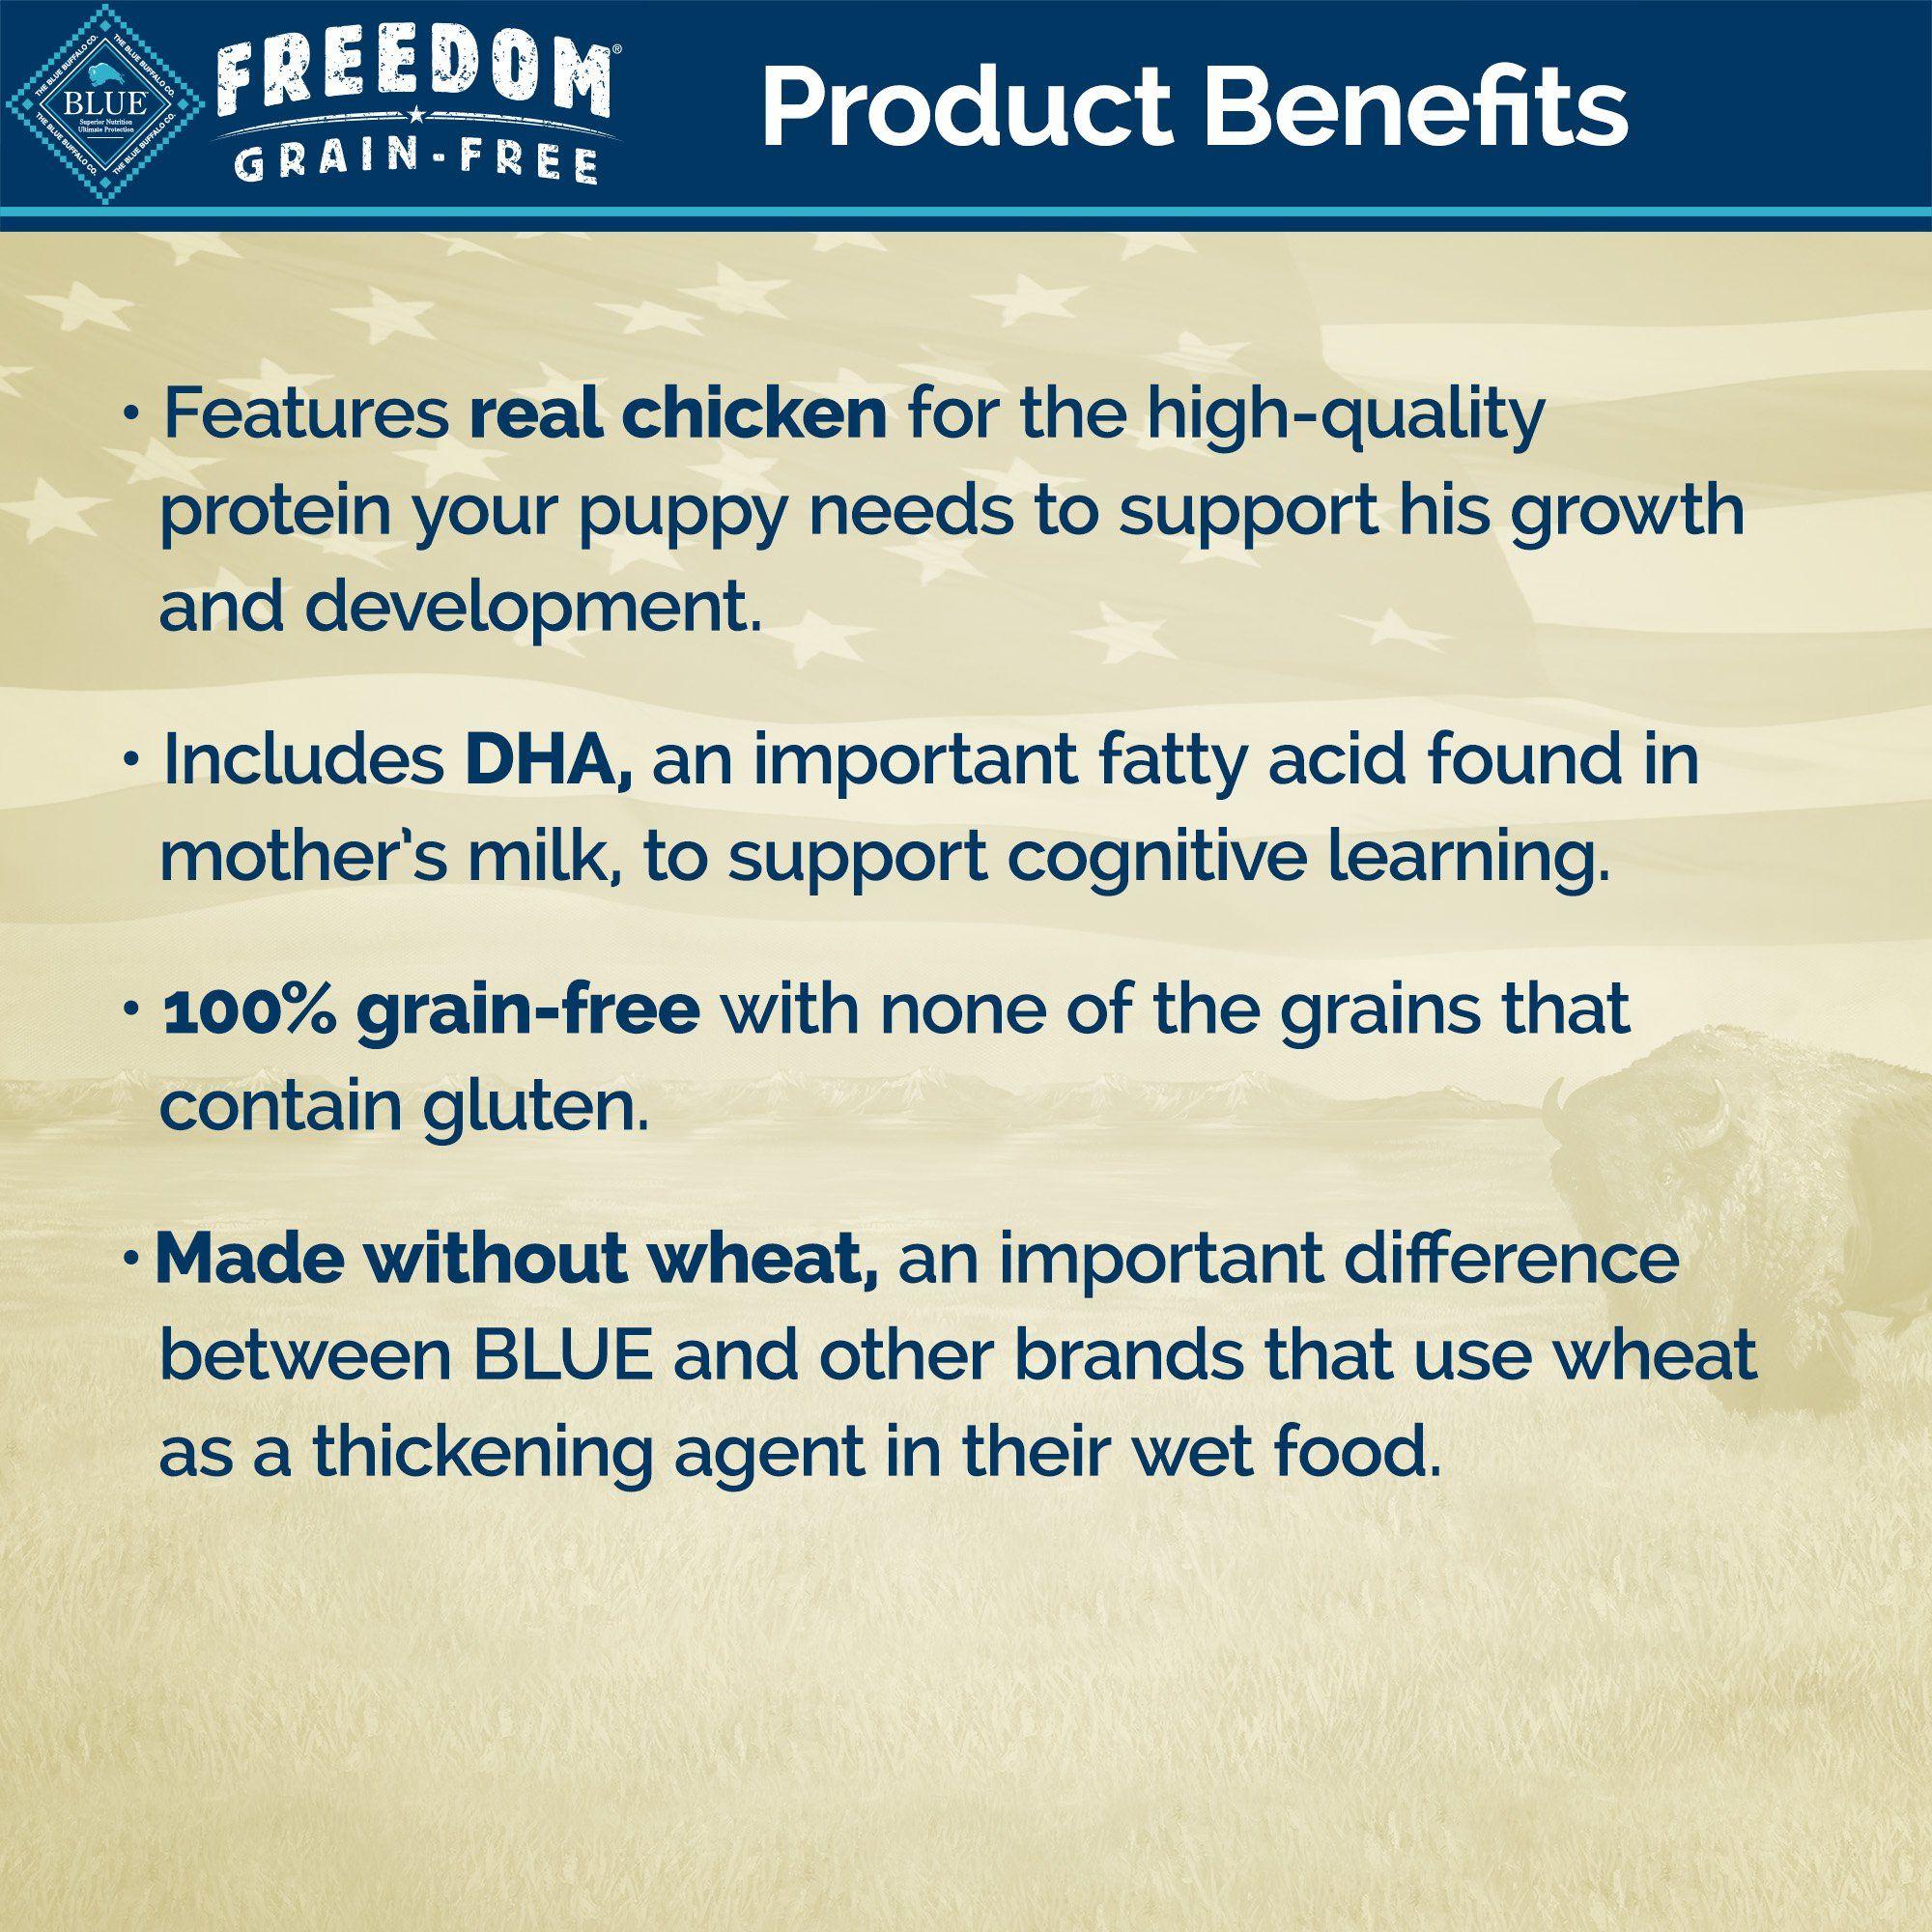 Blue Buffalo Blue Freedom Grain Free Puppy Grain Free Chicken